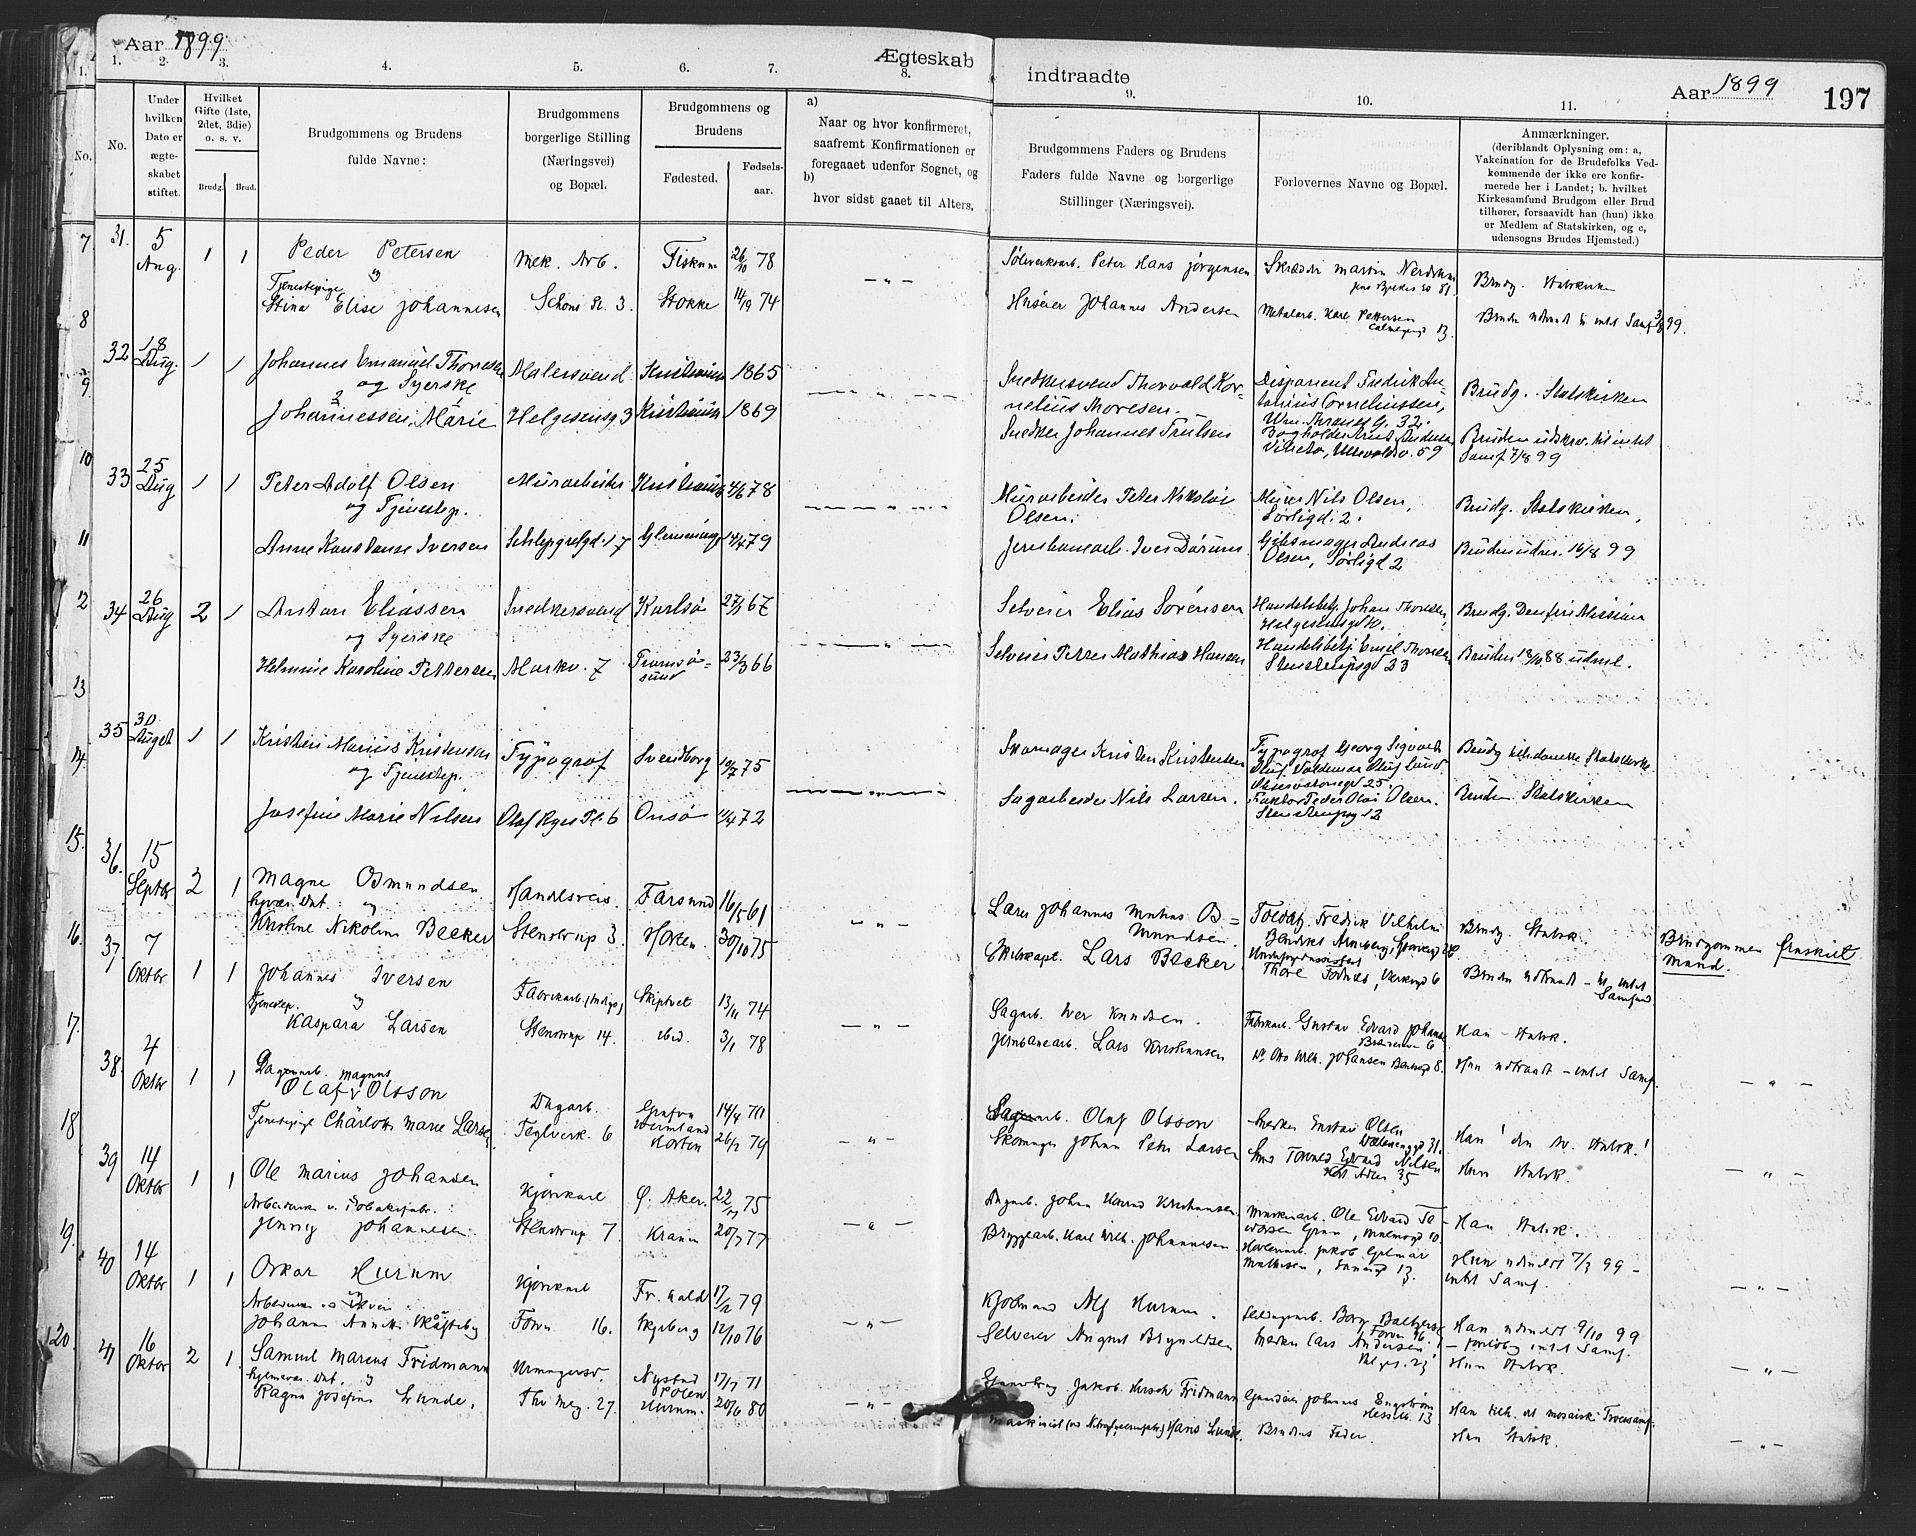 SAO, Paulus prestekontor Kirkebøker, F/Fa/L0012: Ministerialbok nr. 12, 1897-1908, s. 197